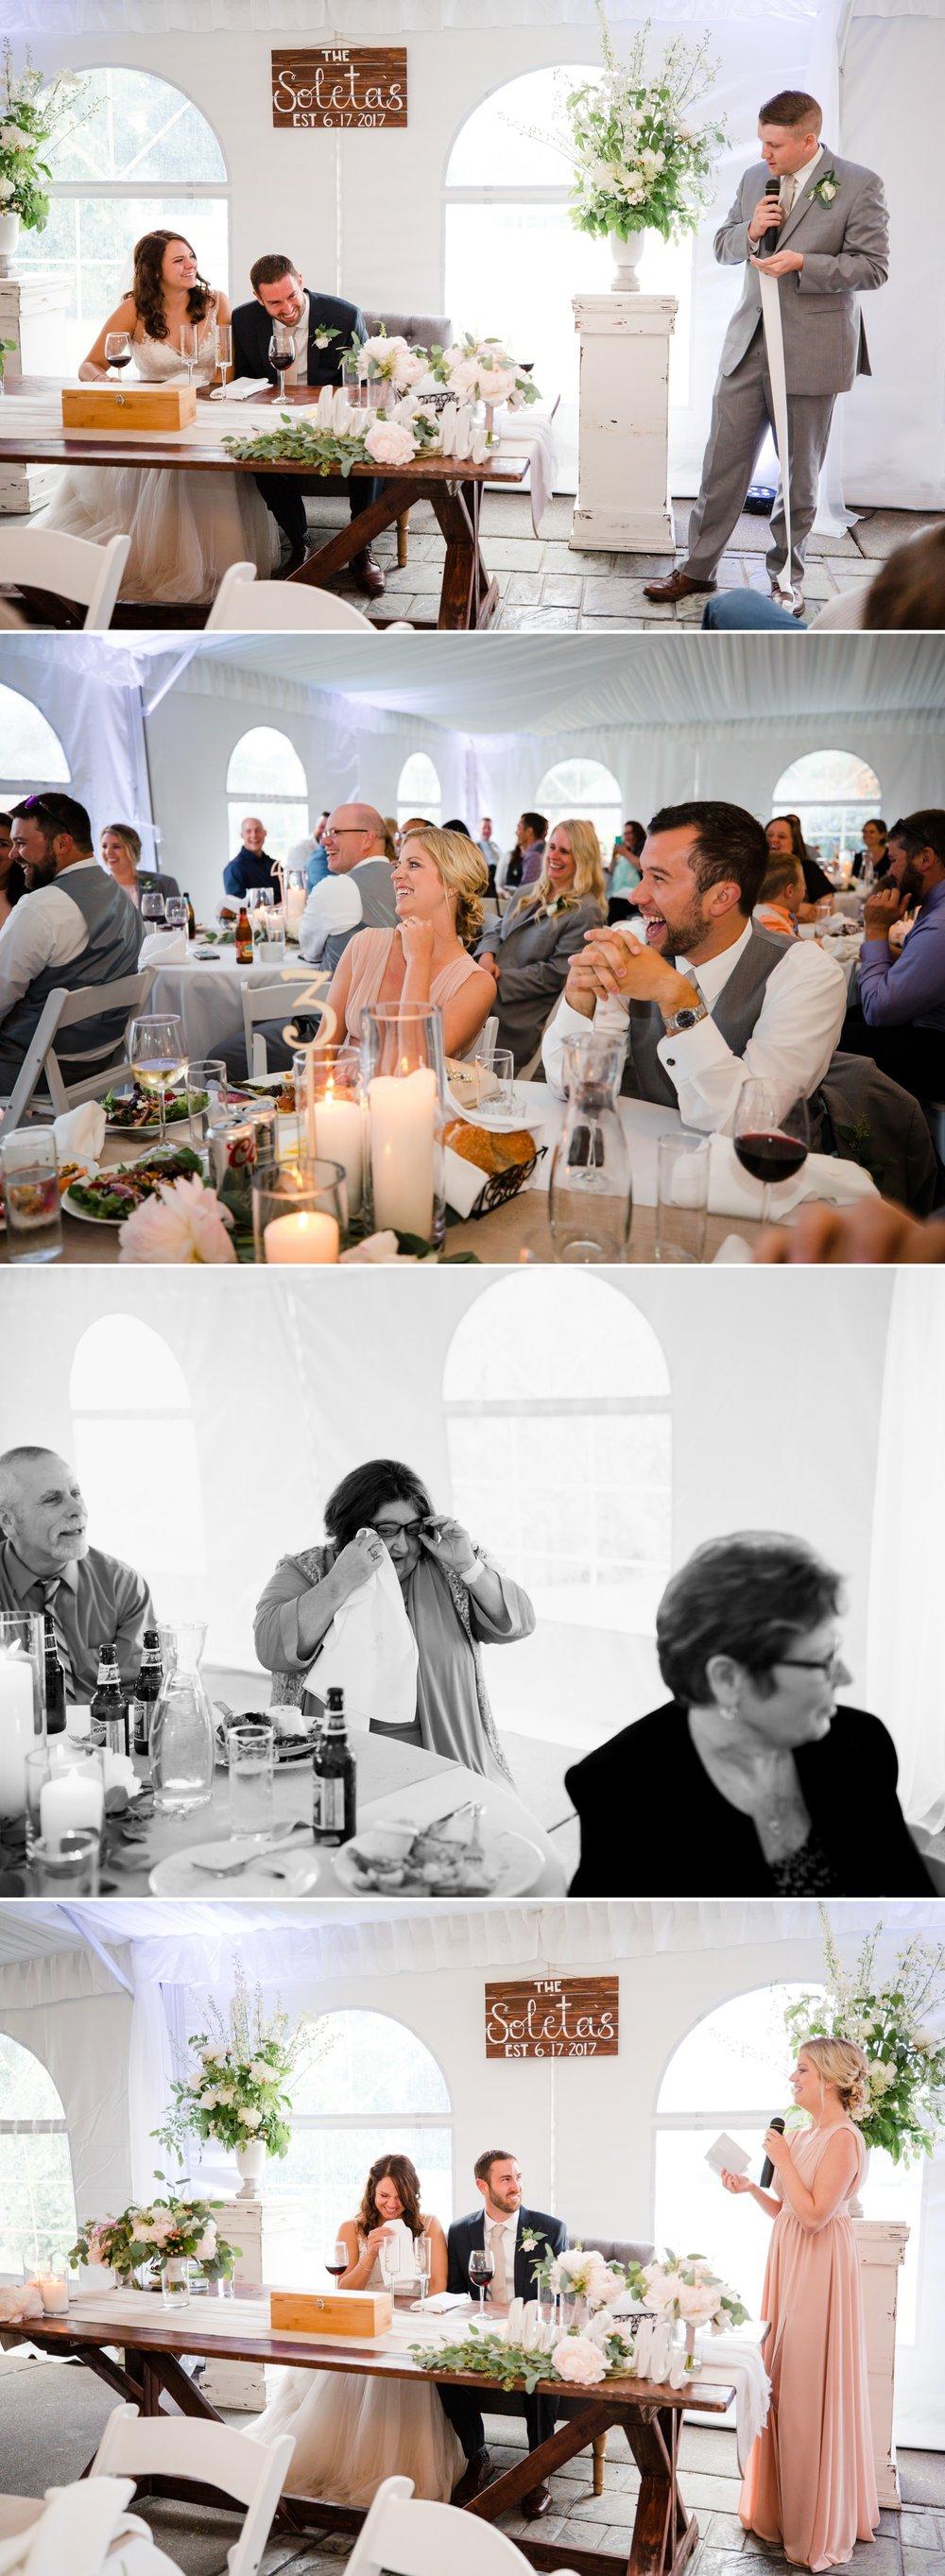 26-port-gamble-wedding-reception.jpg